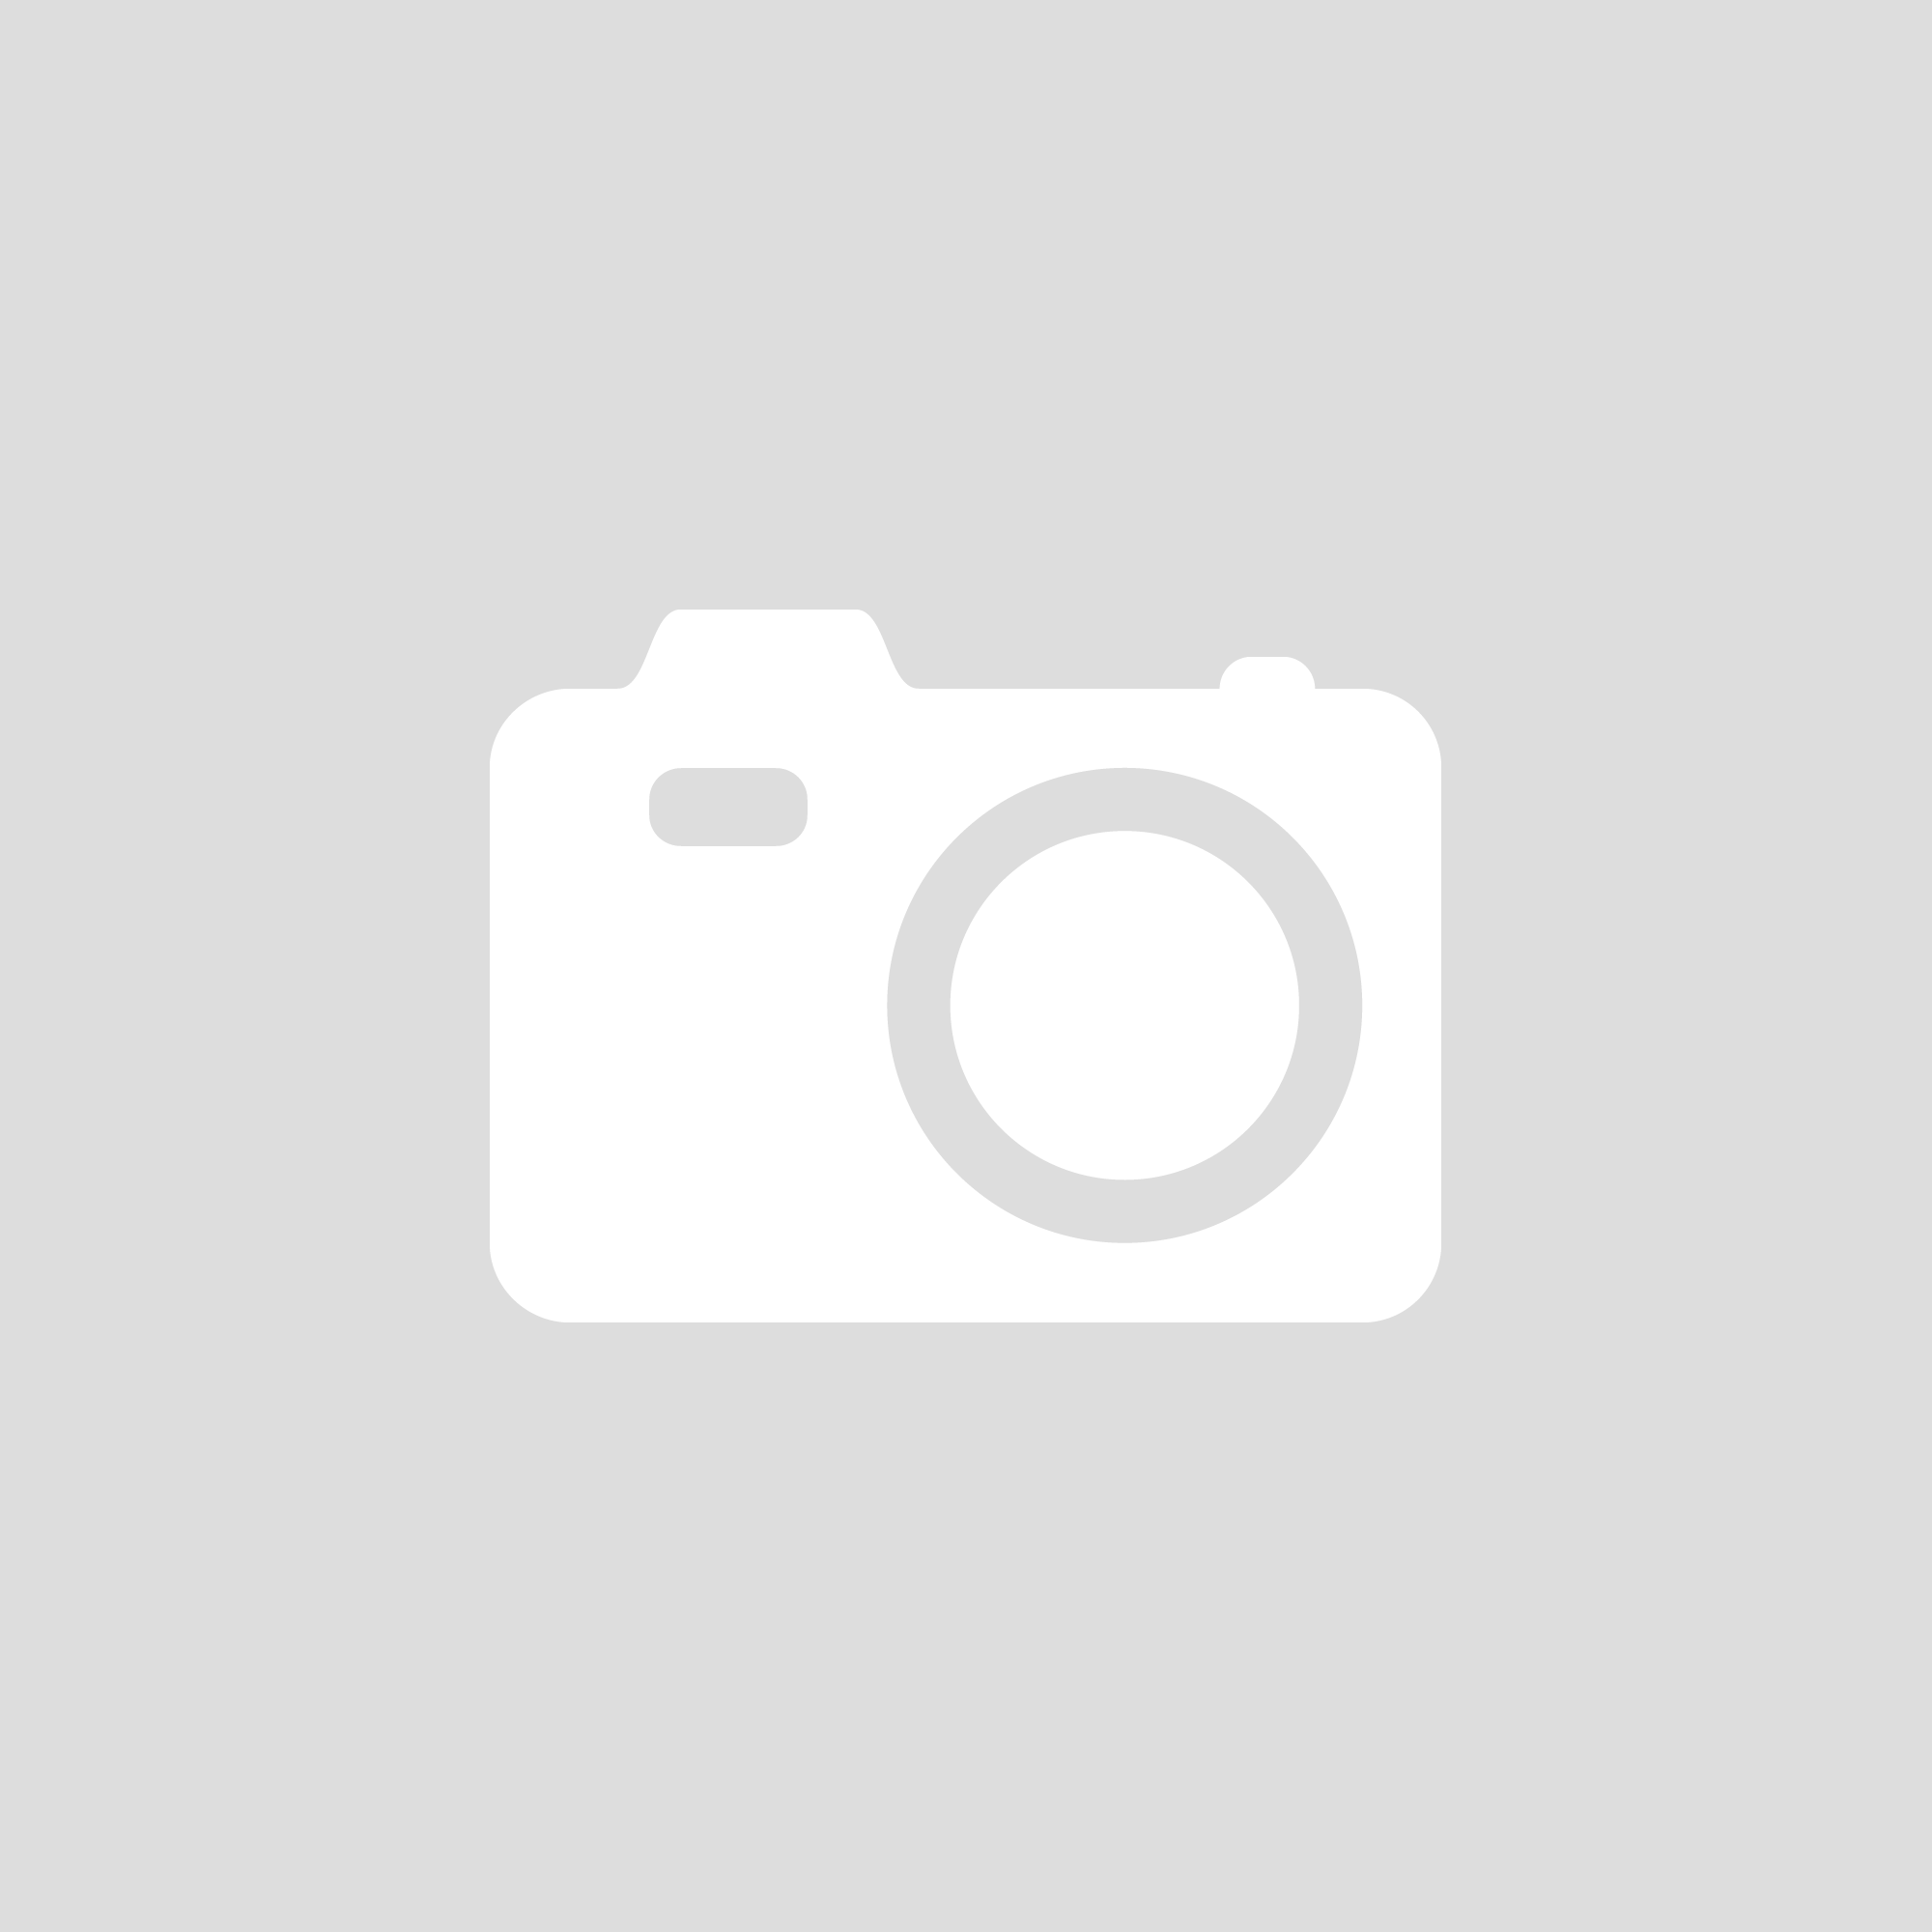 Organza Rose Cushion in Black / Gold by CIMC